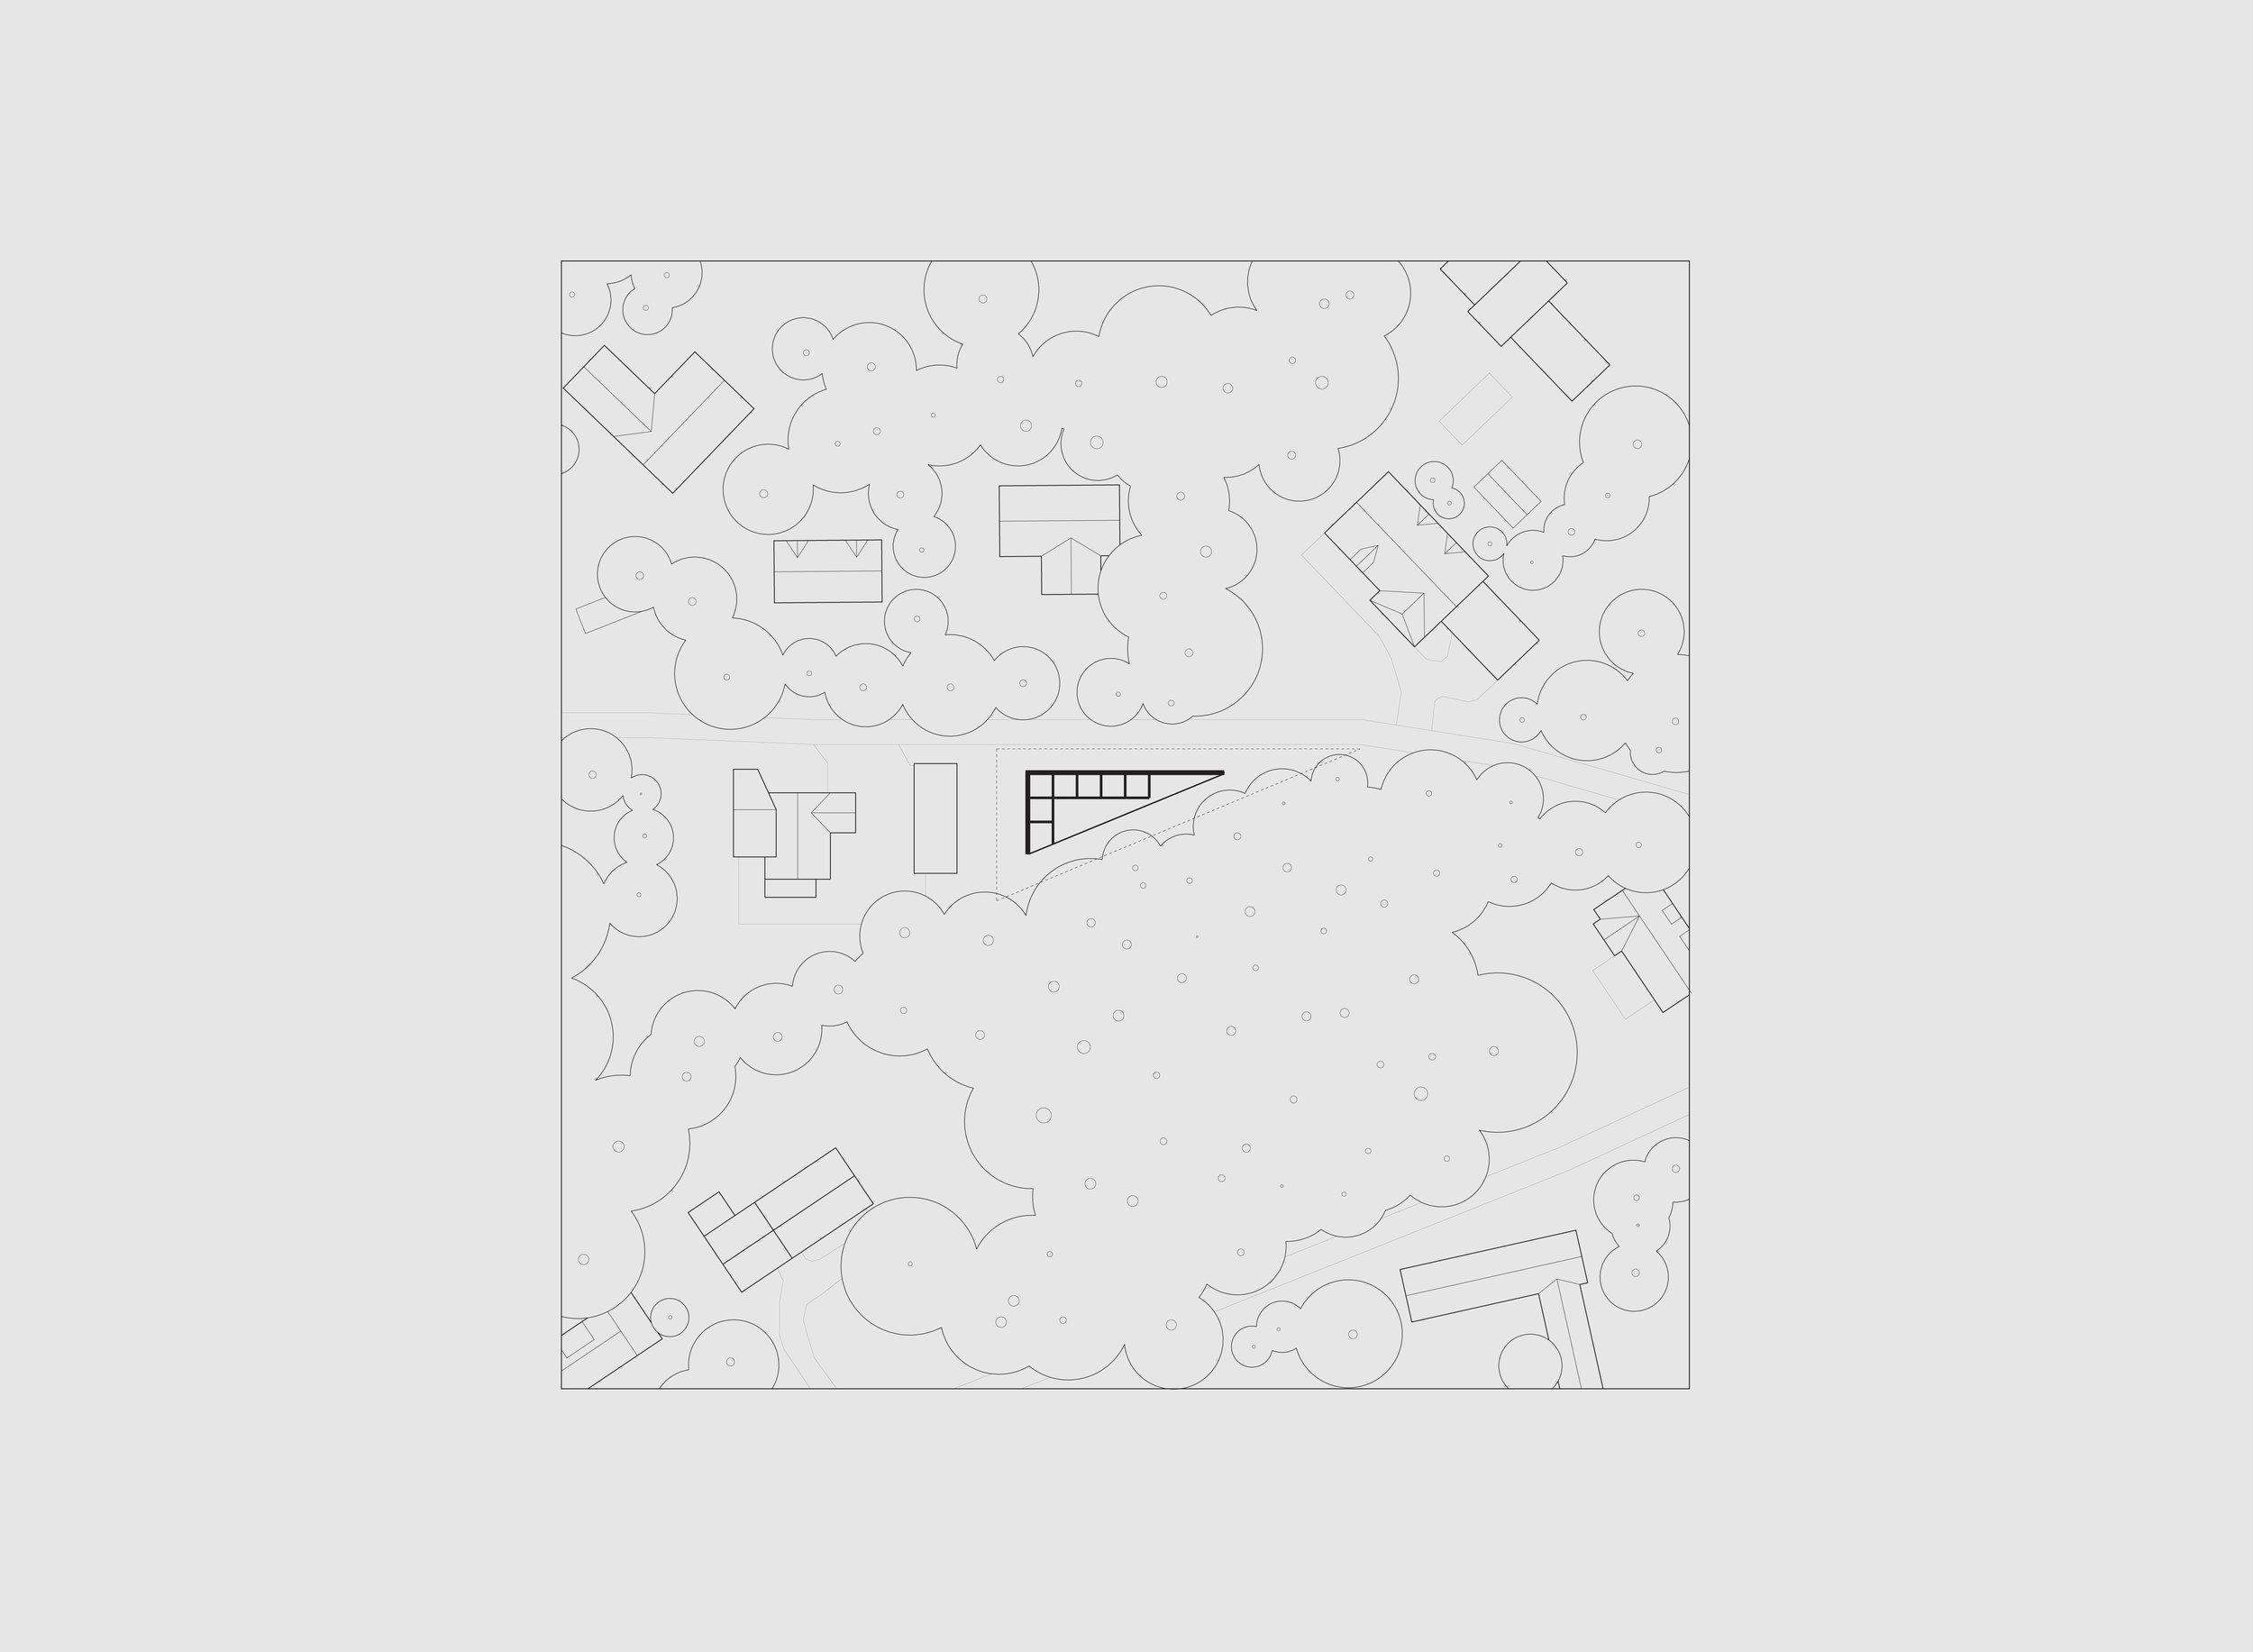 sitemap-01-01.jpg